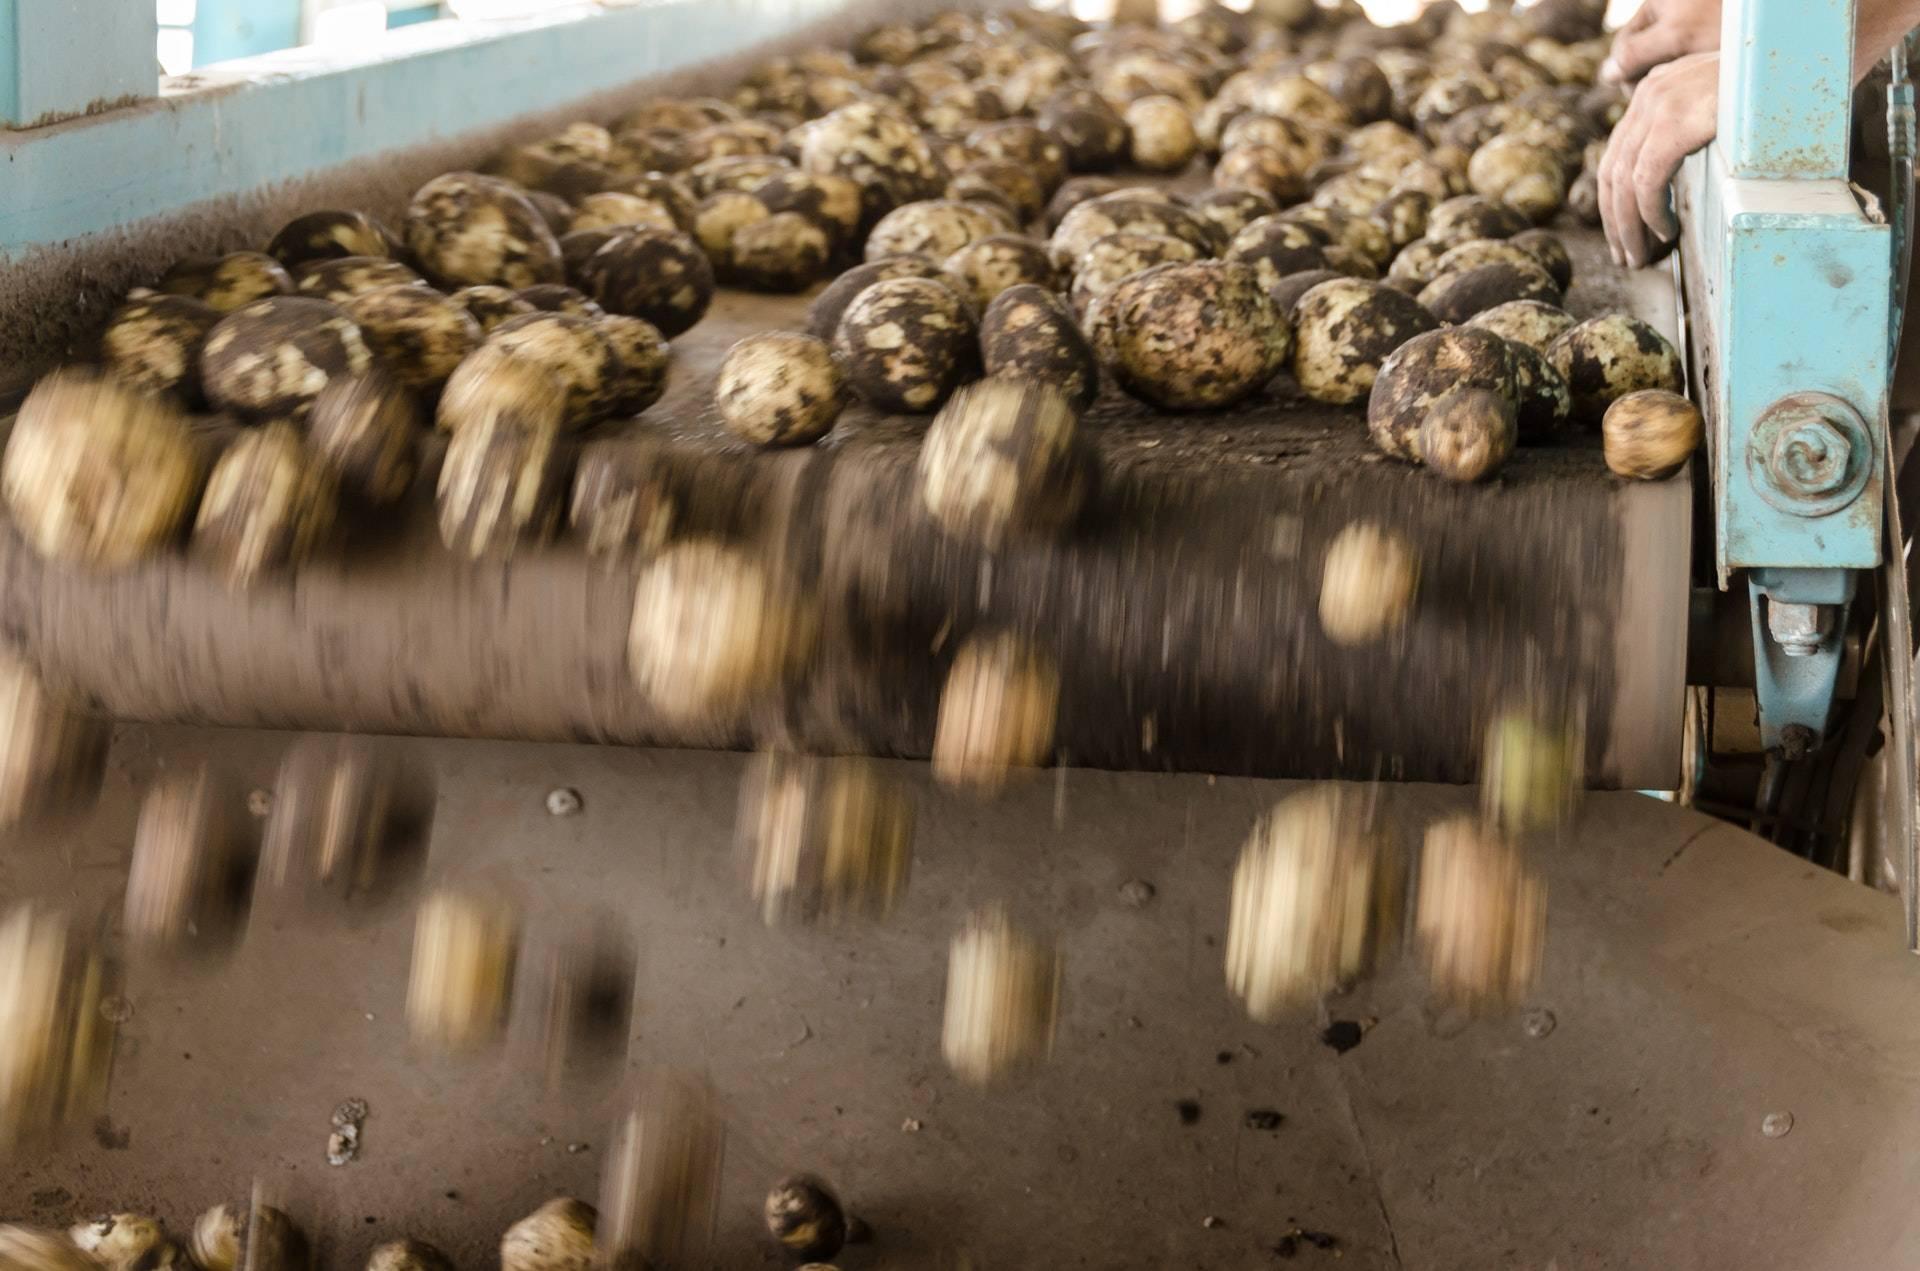 Phot of potatoes falling of a conveyor belt